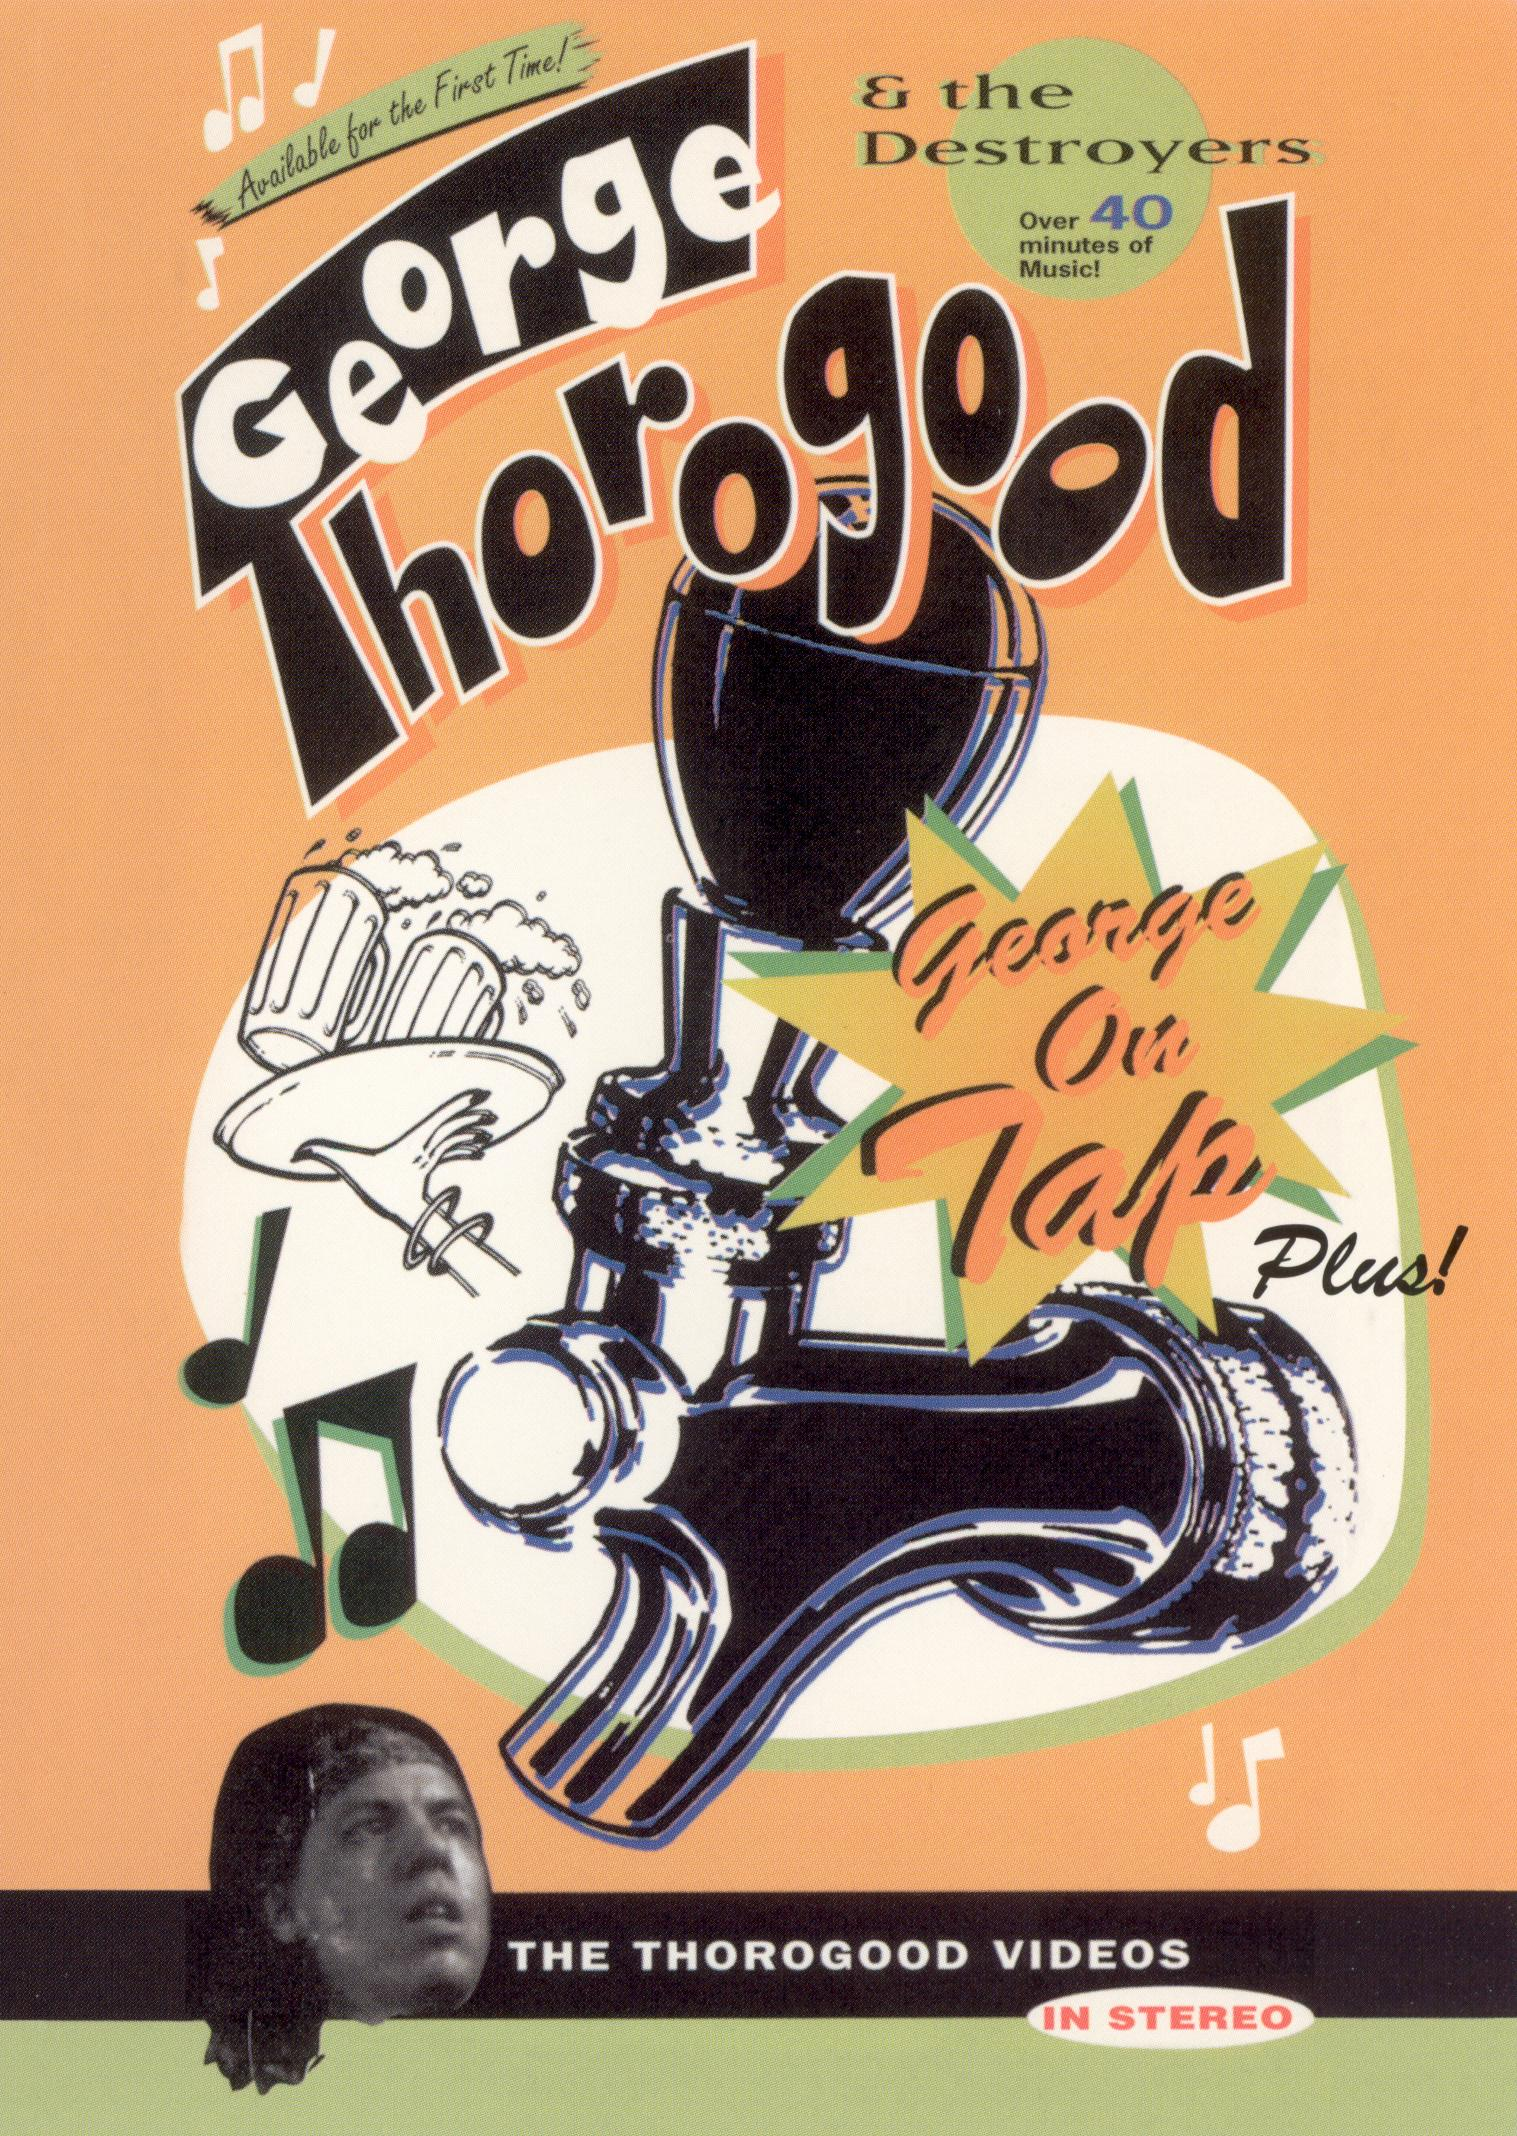 George Thorogood & The Destroyers: George on Tap - Plus!